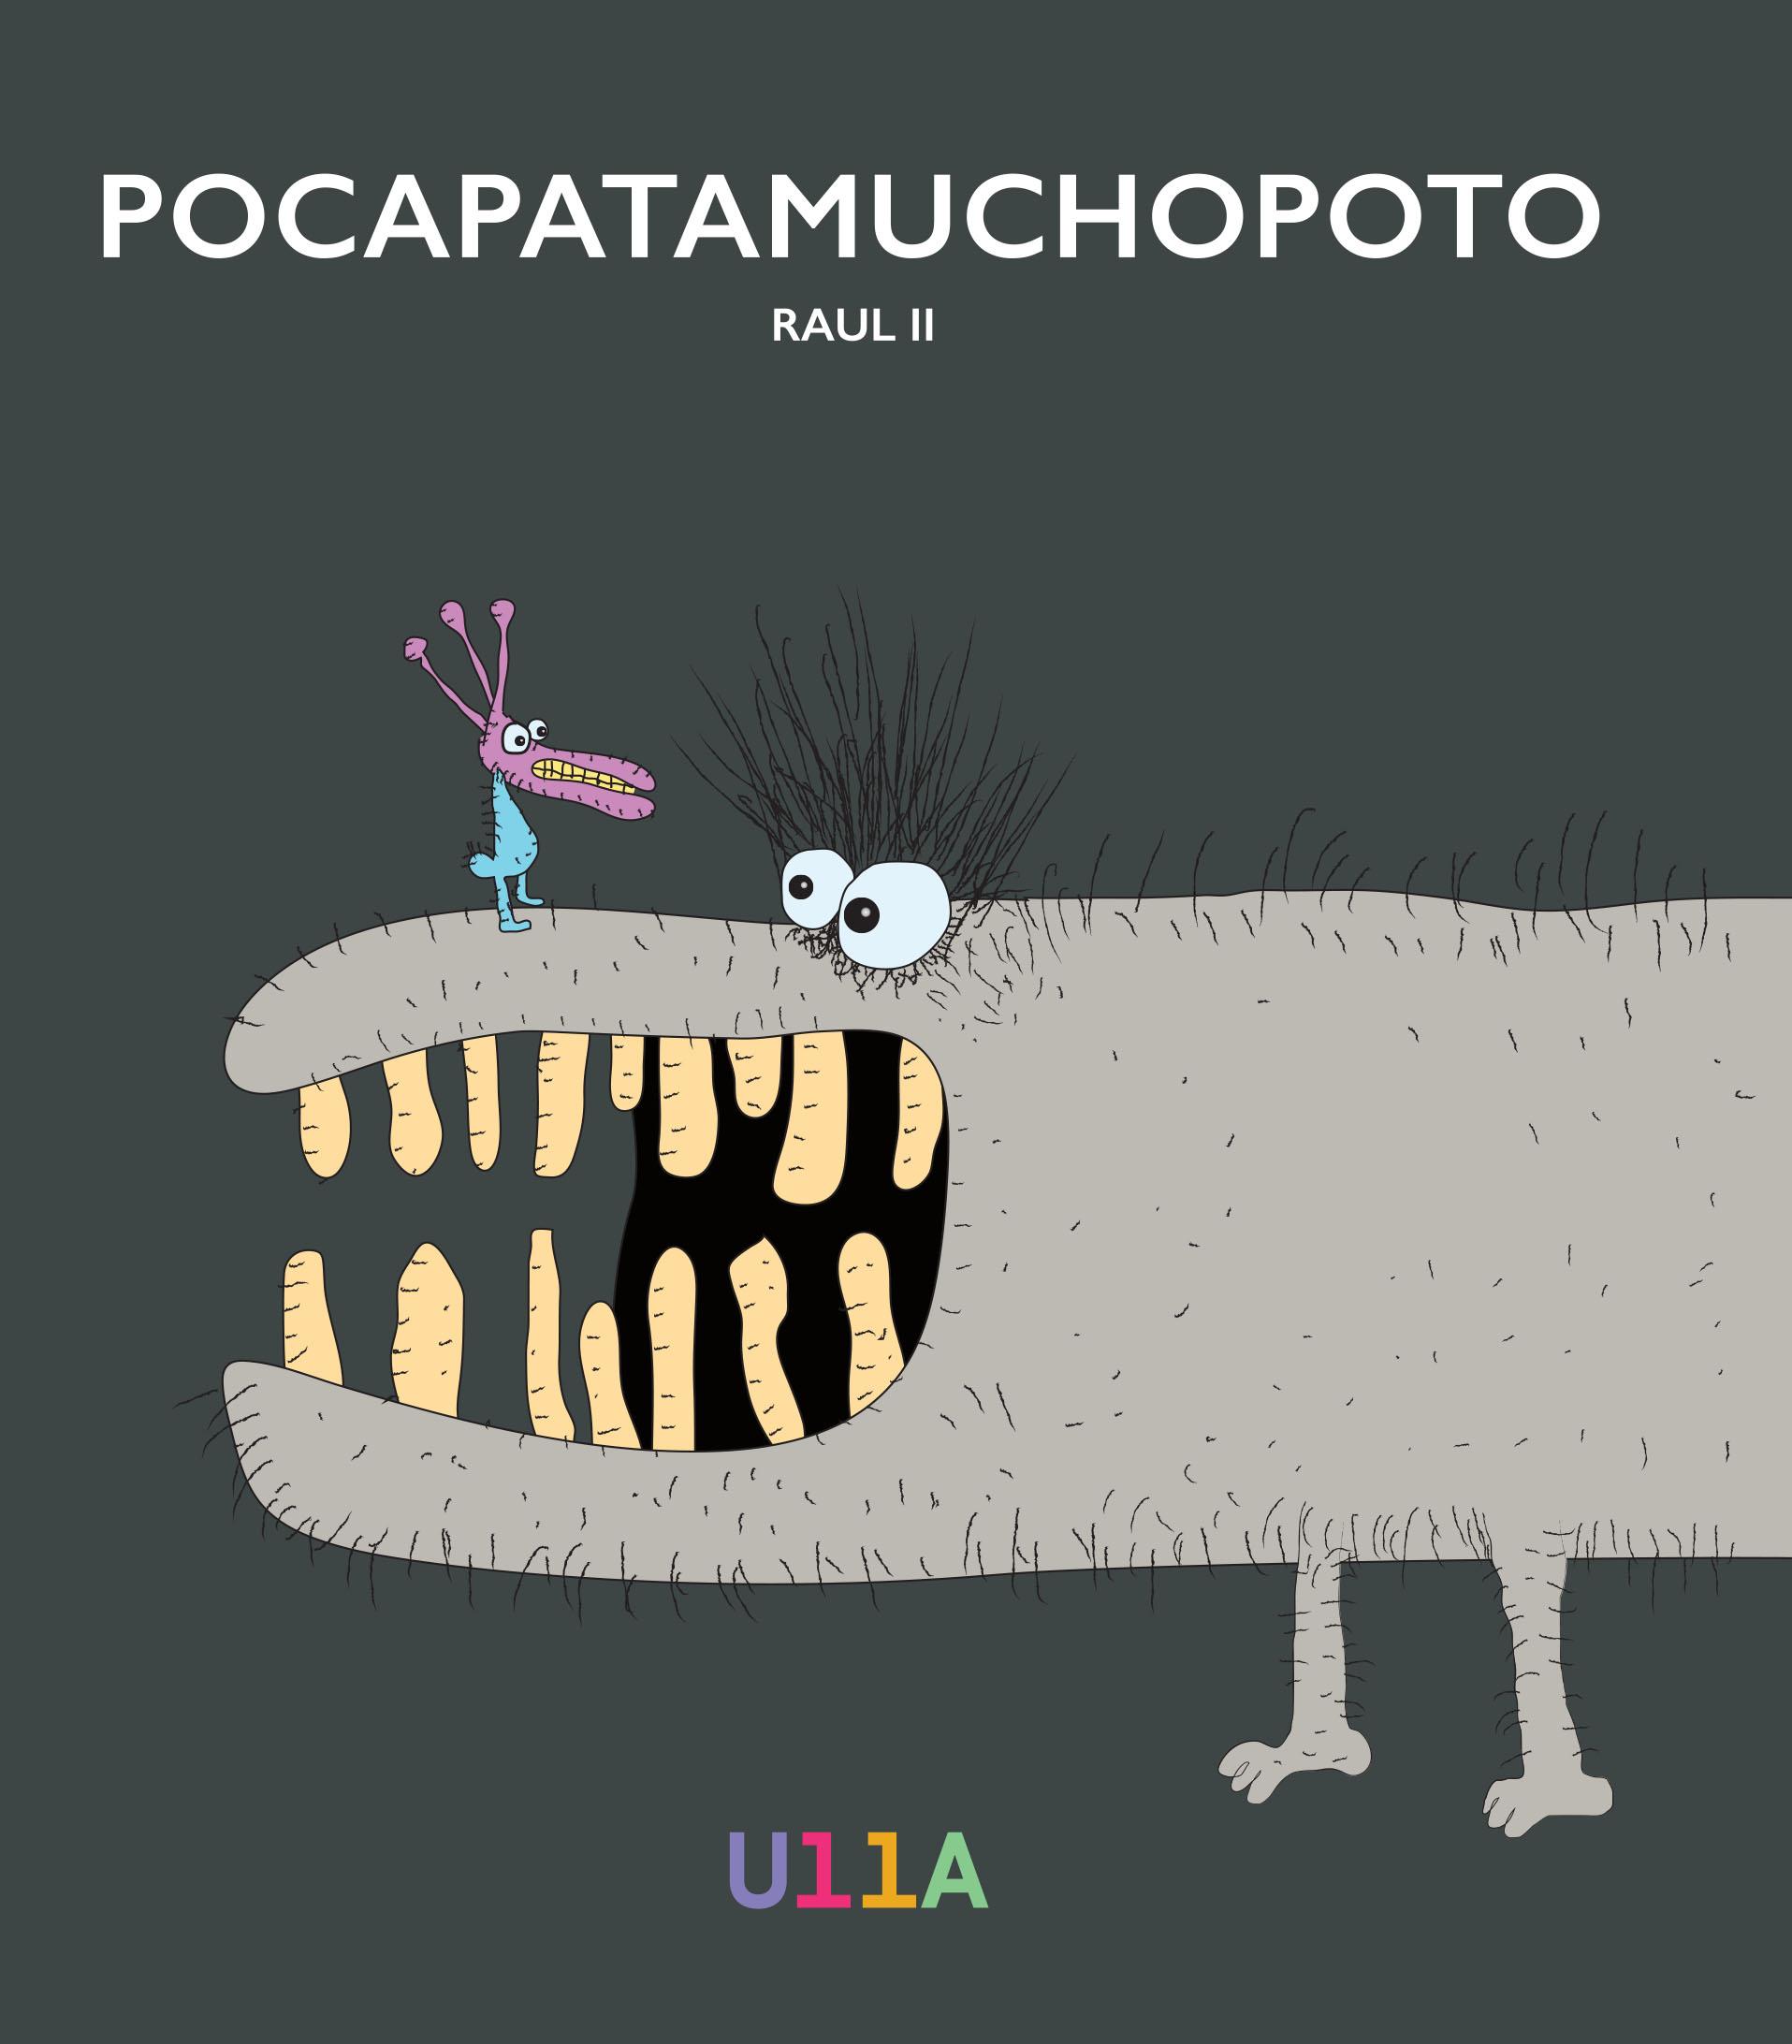 POCAPATAMUCHOPOTO